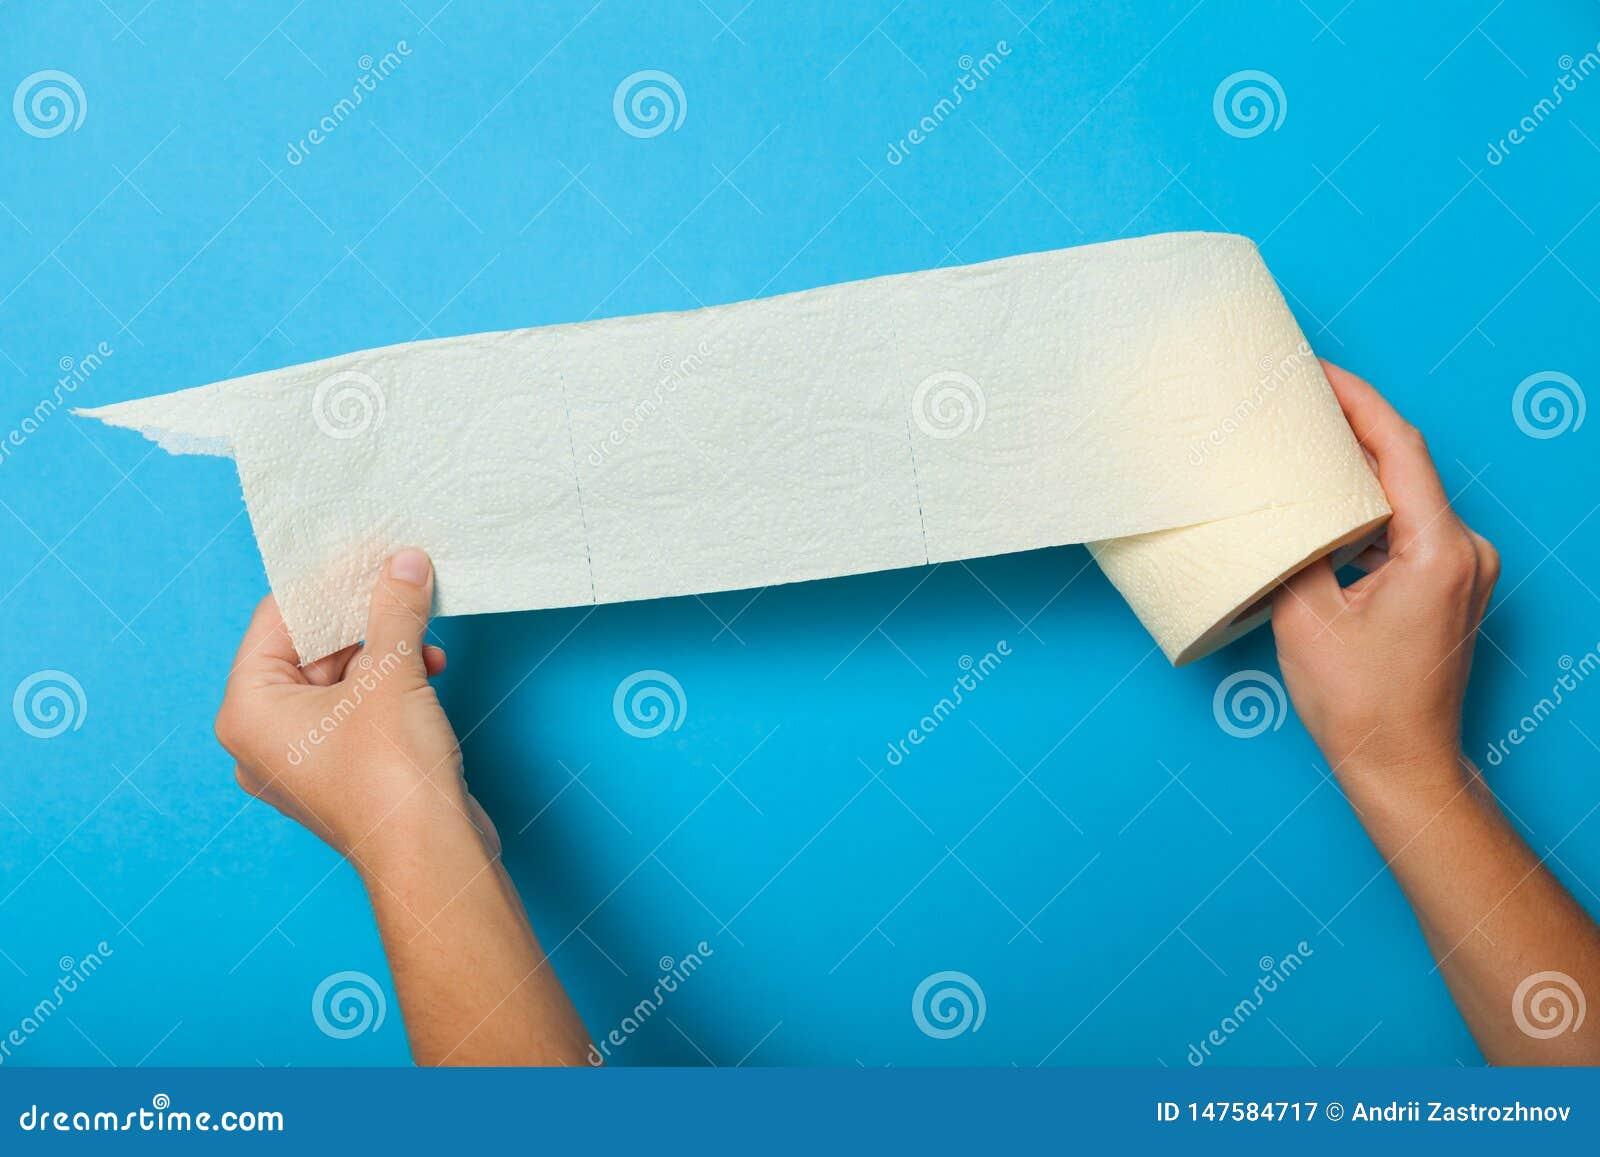 Rolo de toalete do Livro Branco, tecido da higiene WC sanit?rio di?rio